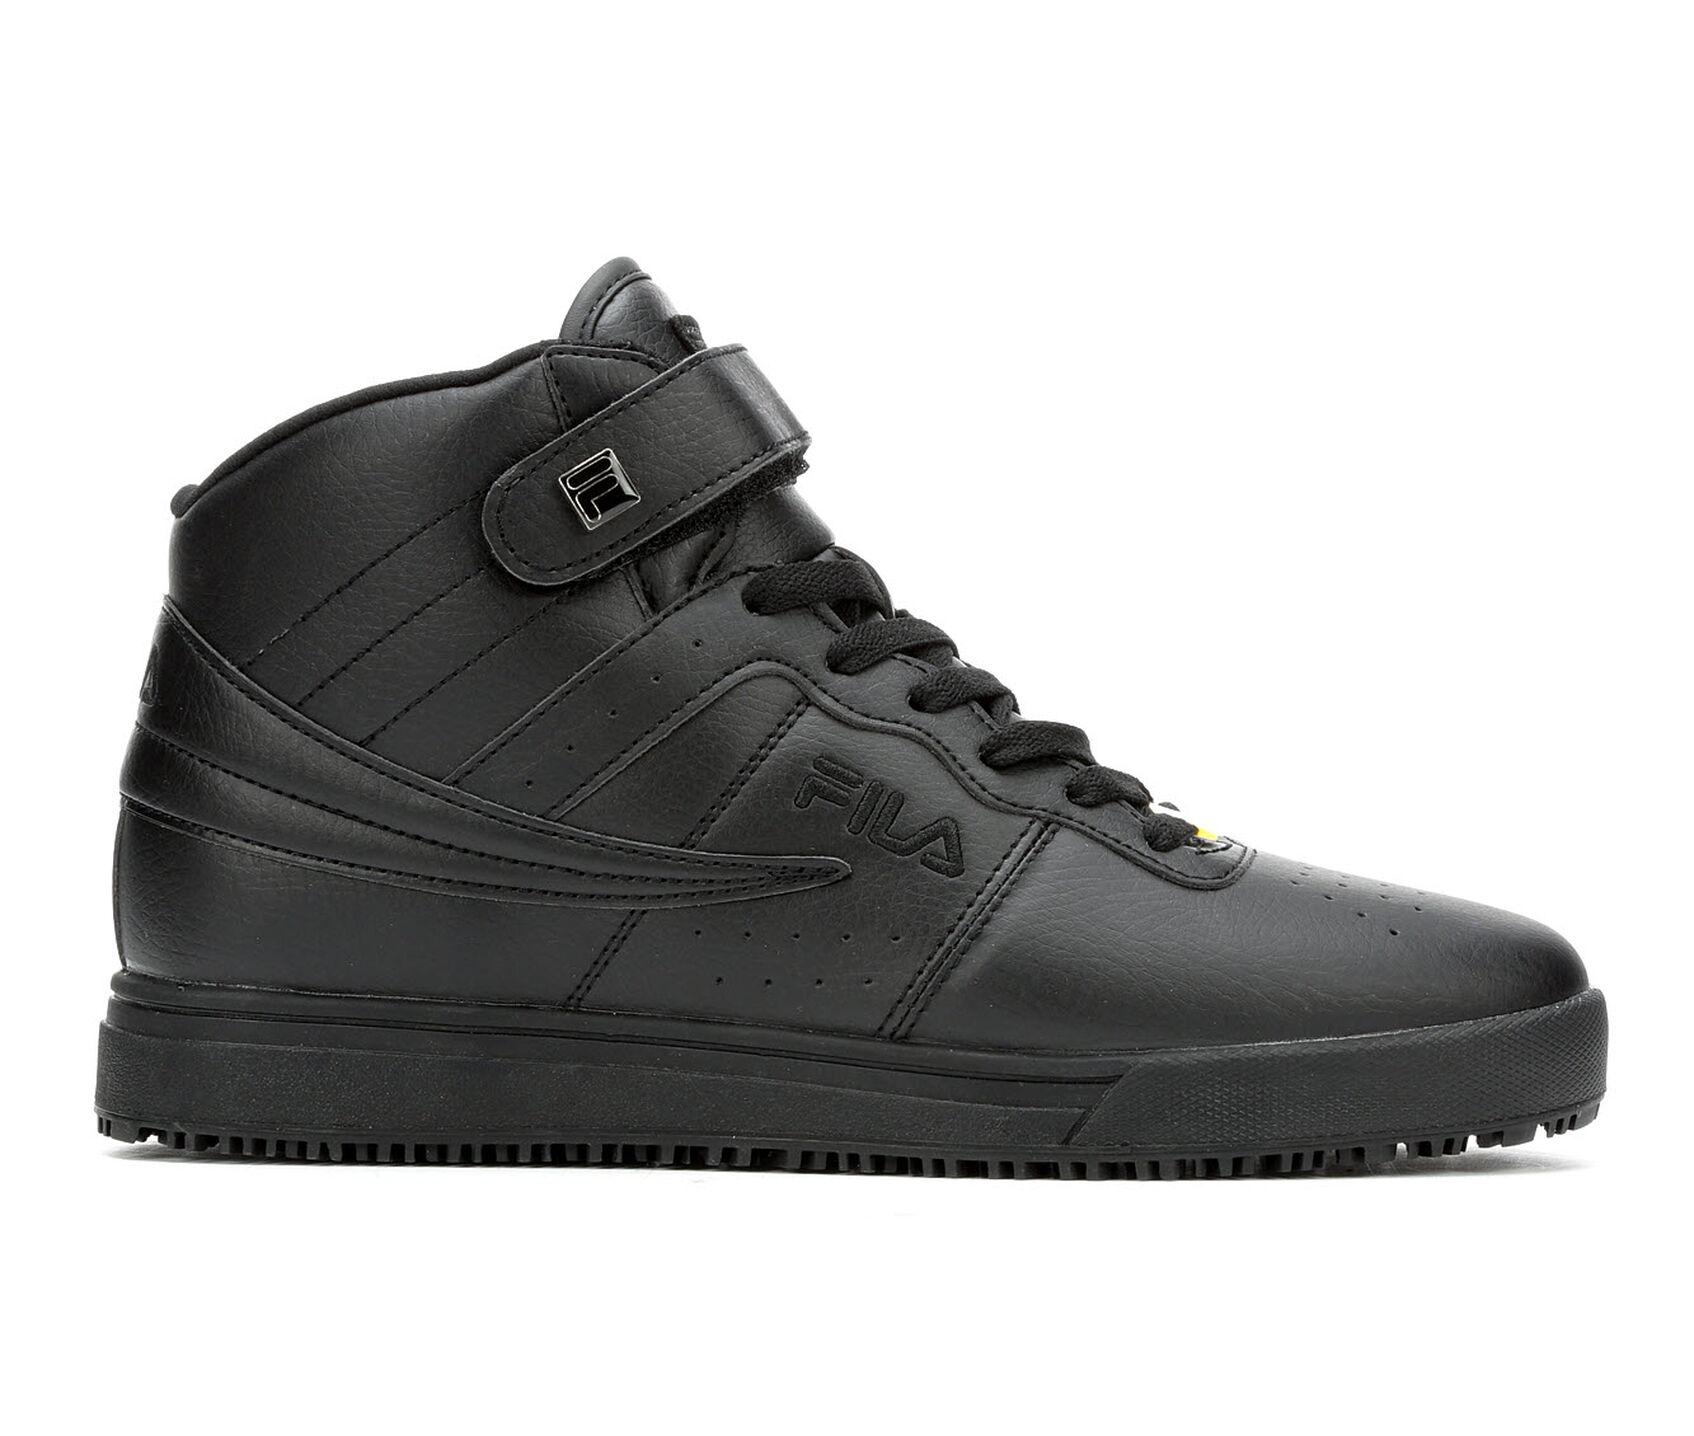 4a722459 Men's Fila Vulc 13 Slip Resistant Safety Shoes